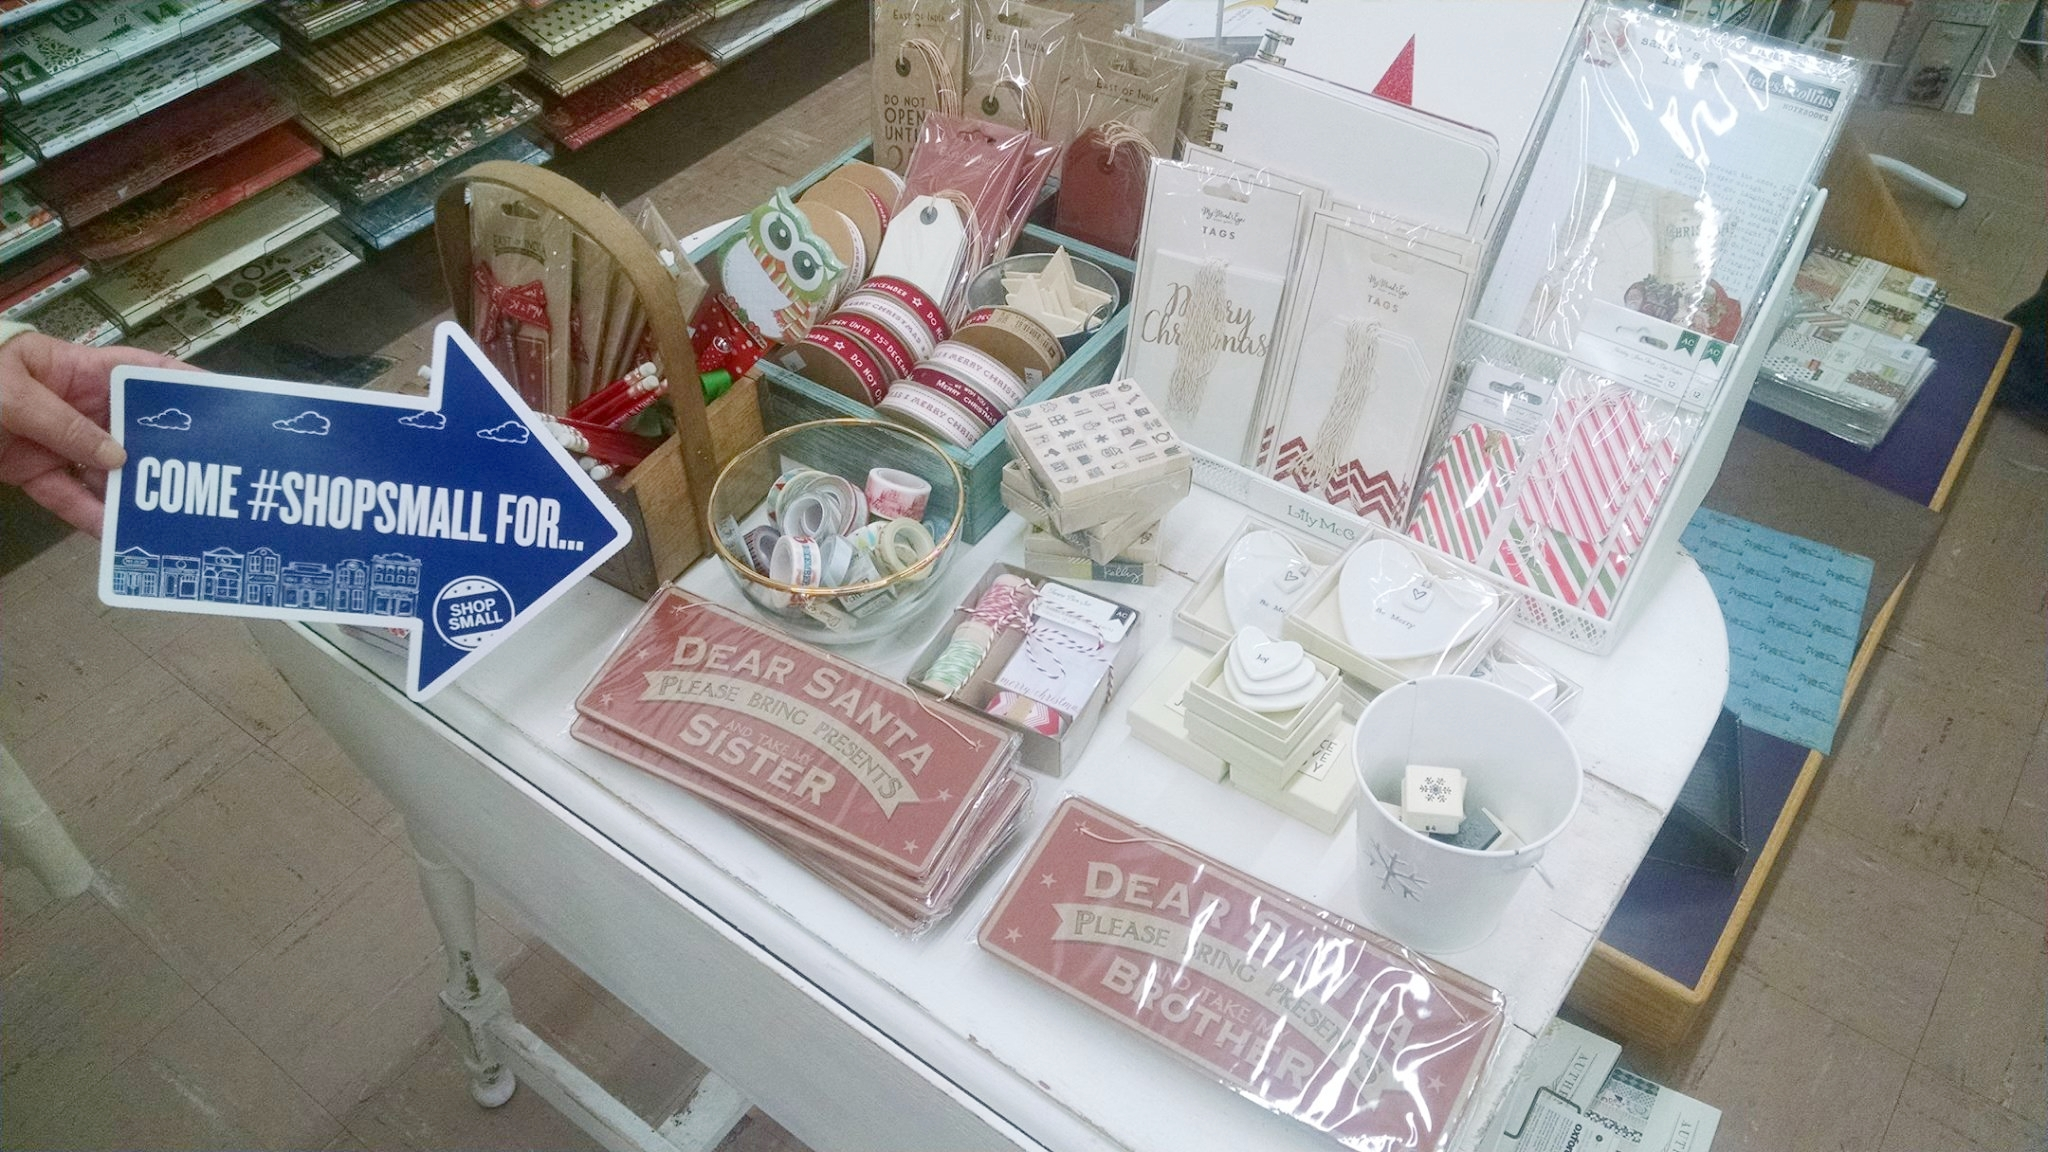 Shop-small-2016-36.jpg